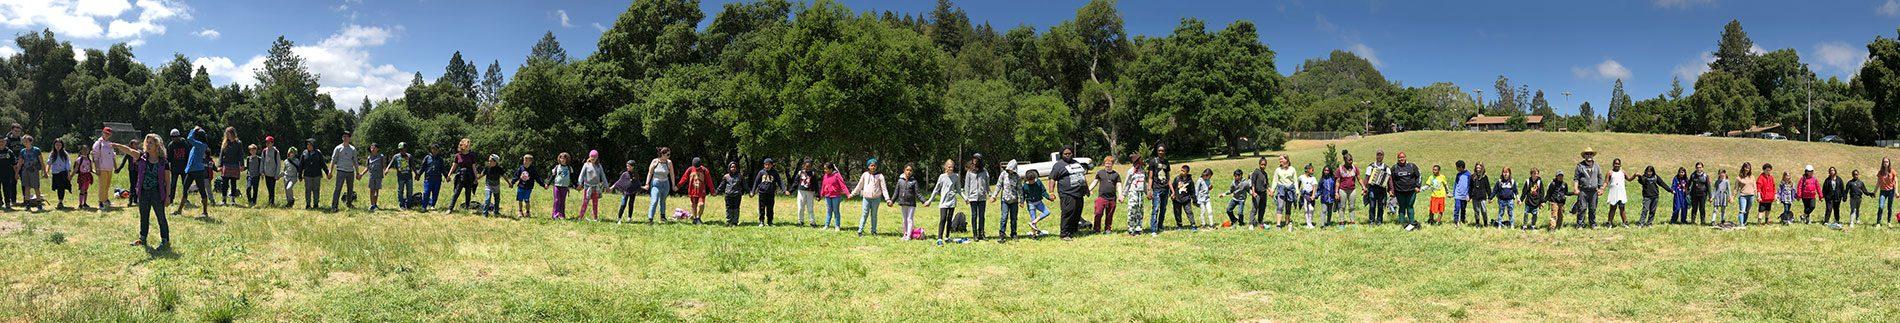 Many kids holding hands in line in field